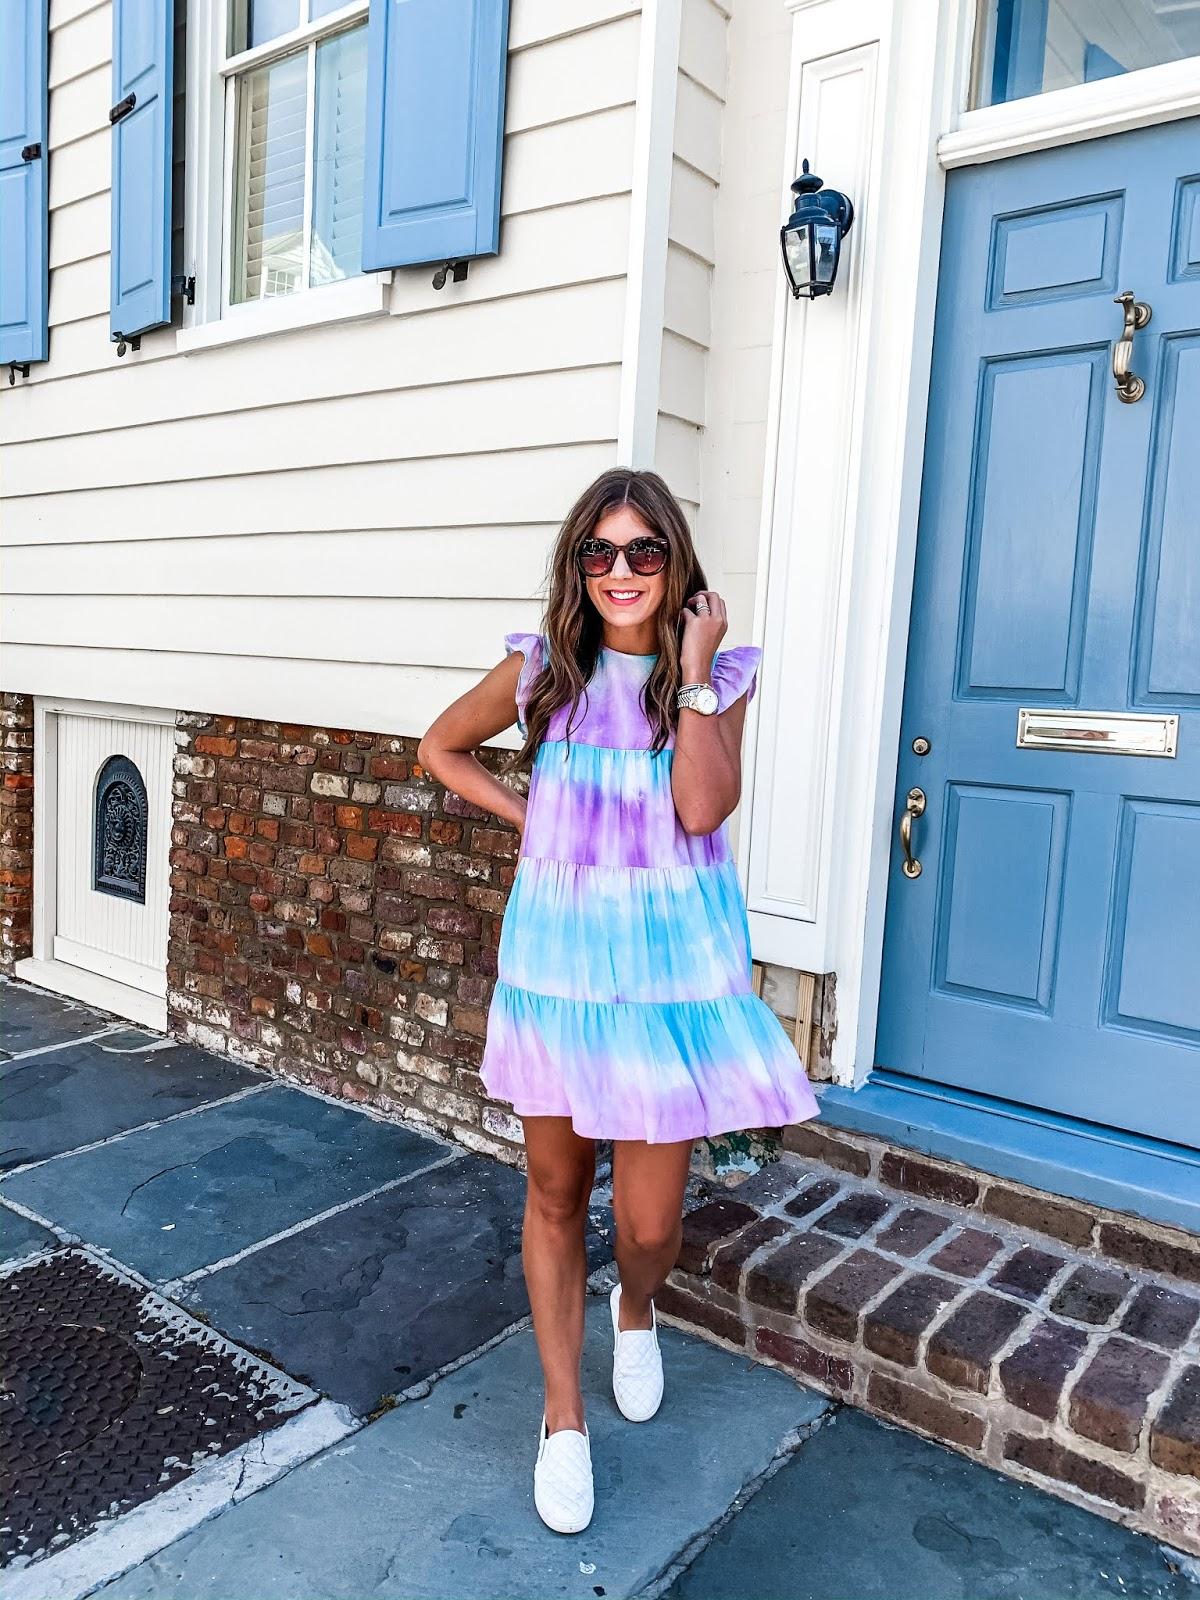 Tie Dye Pieces I Love - Chasing Cinderella